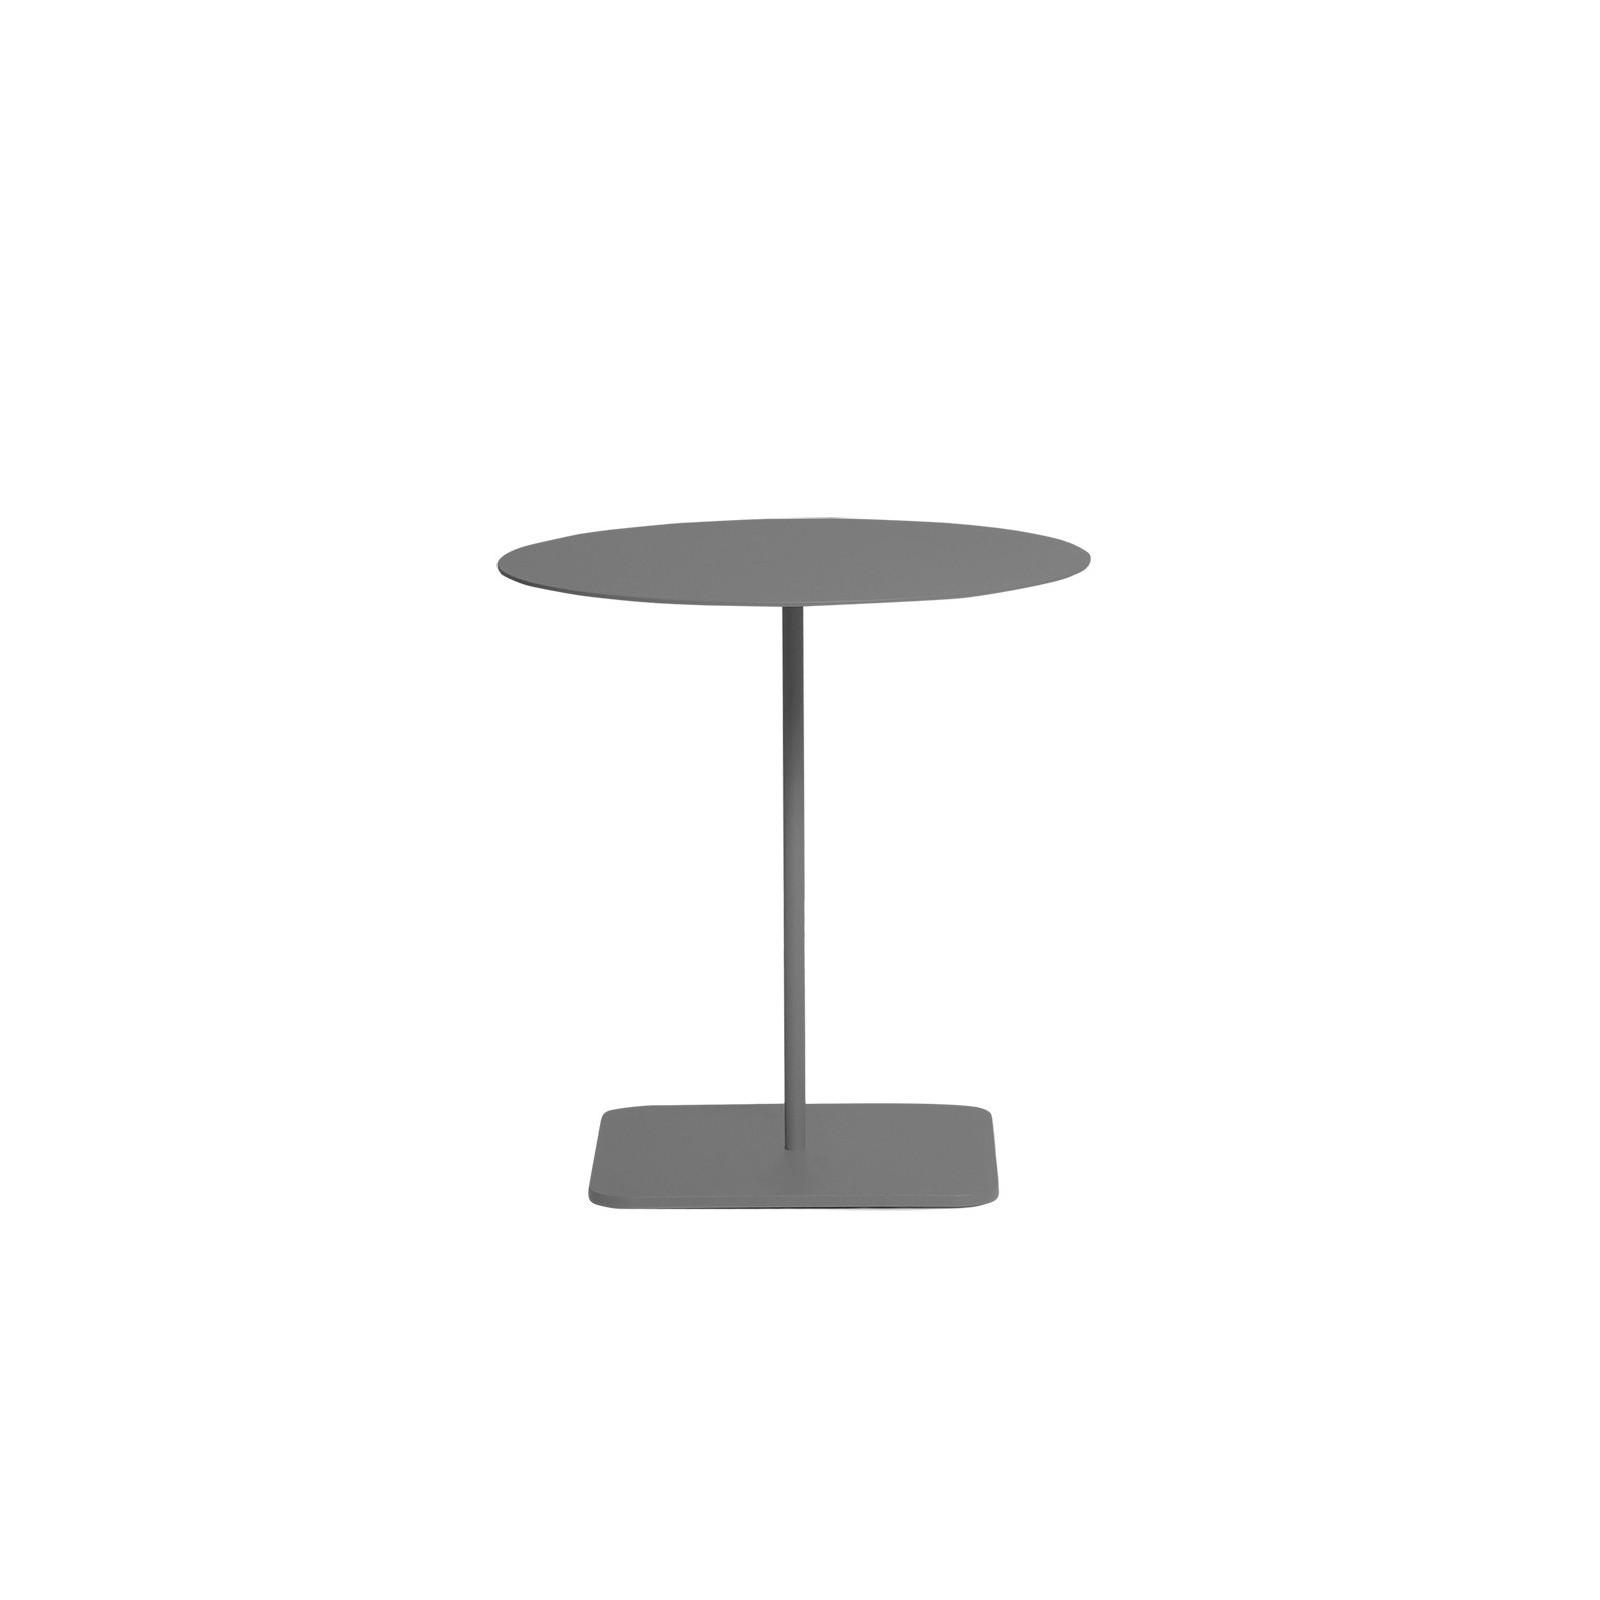 Mesita coffee table - 42 - grey